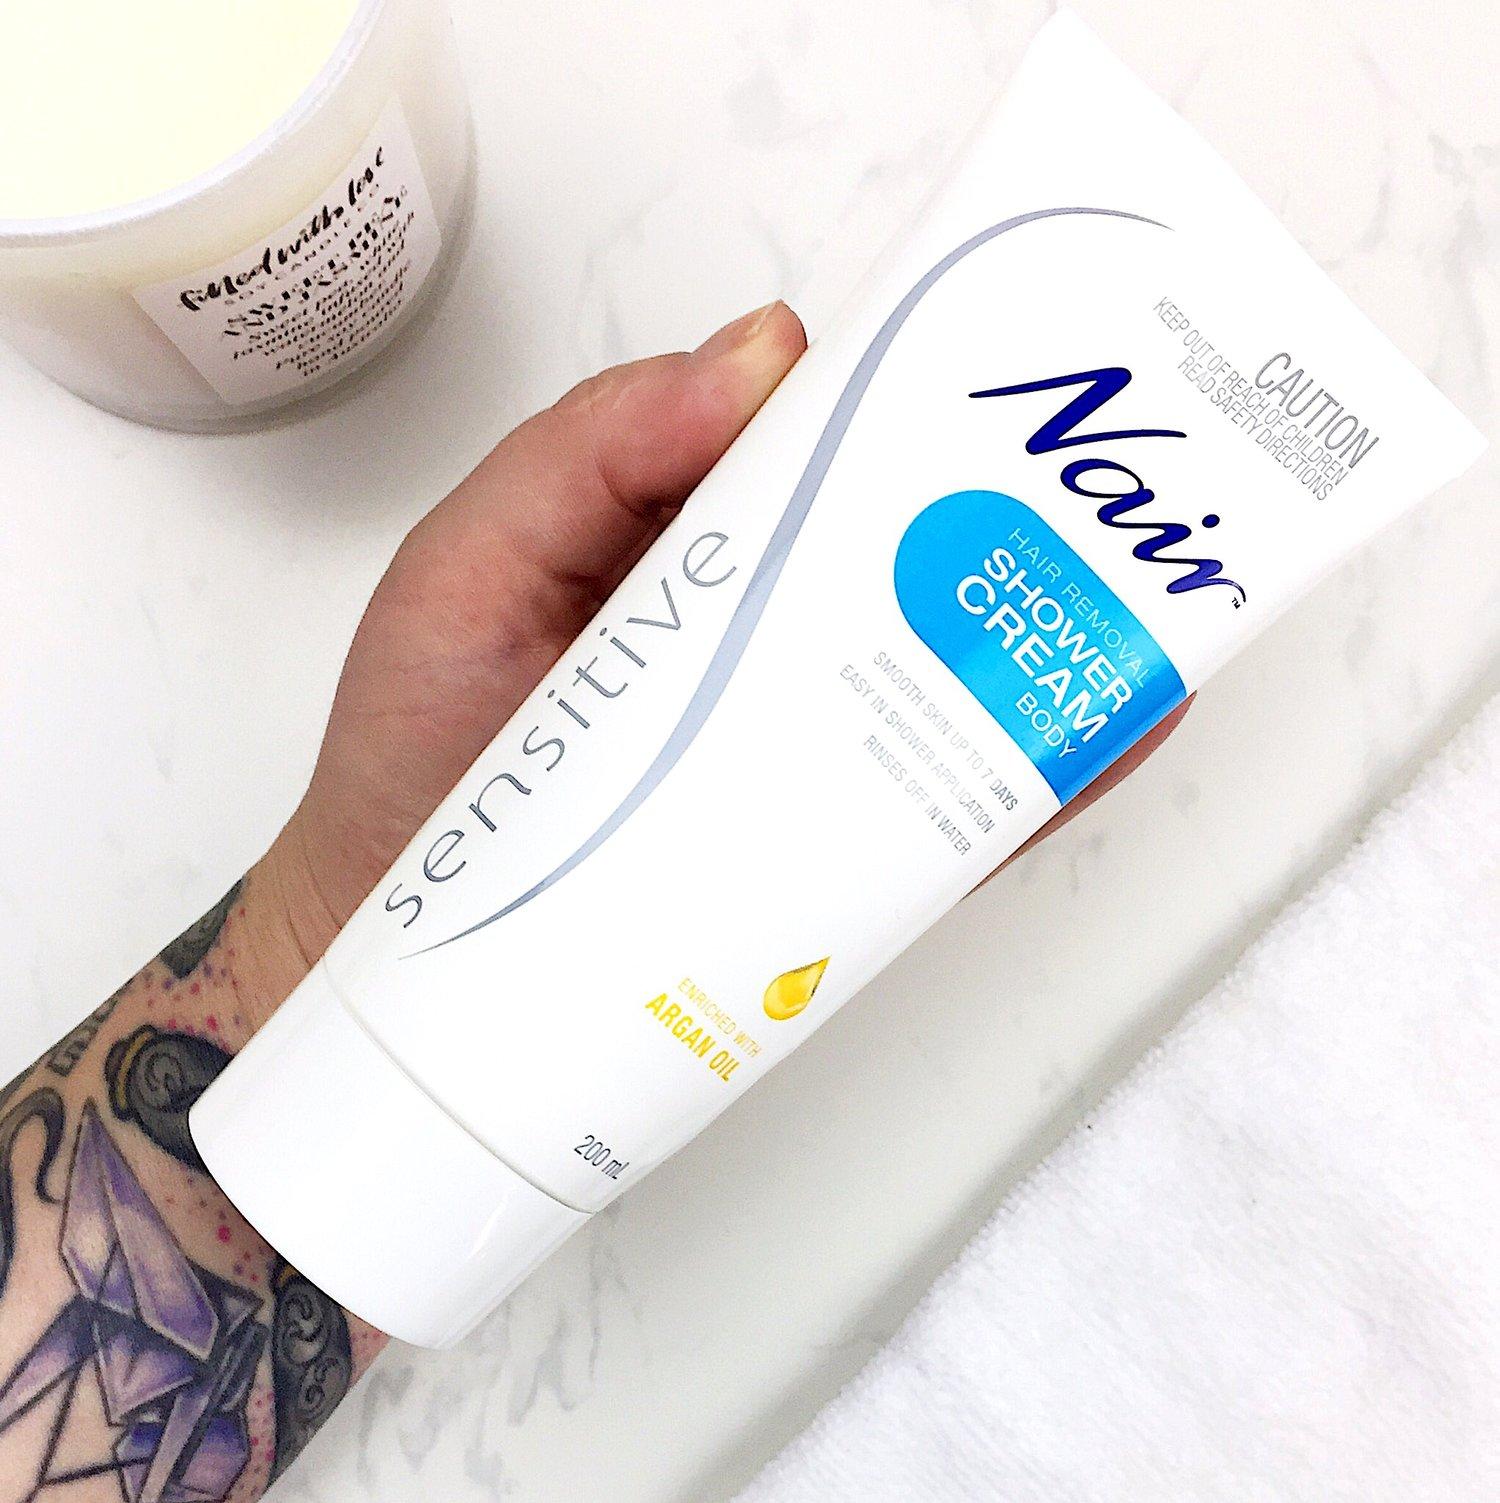 Nair Sensitive Hair Removal Shower Cream Review